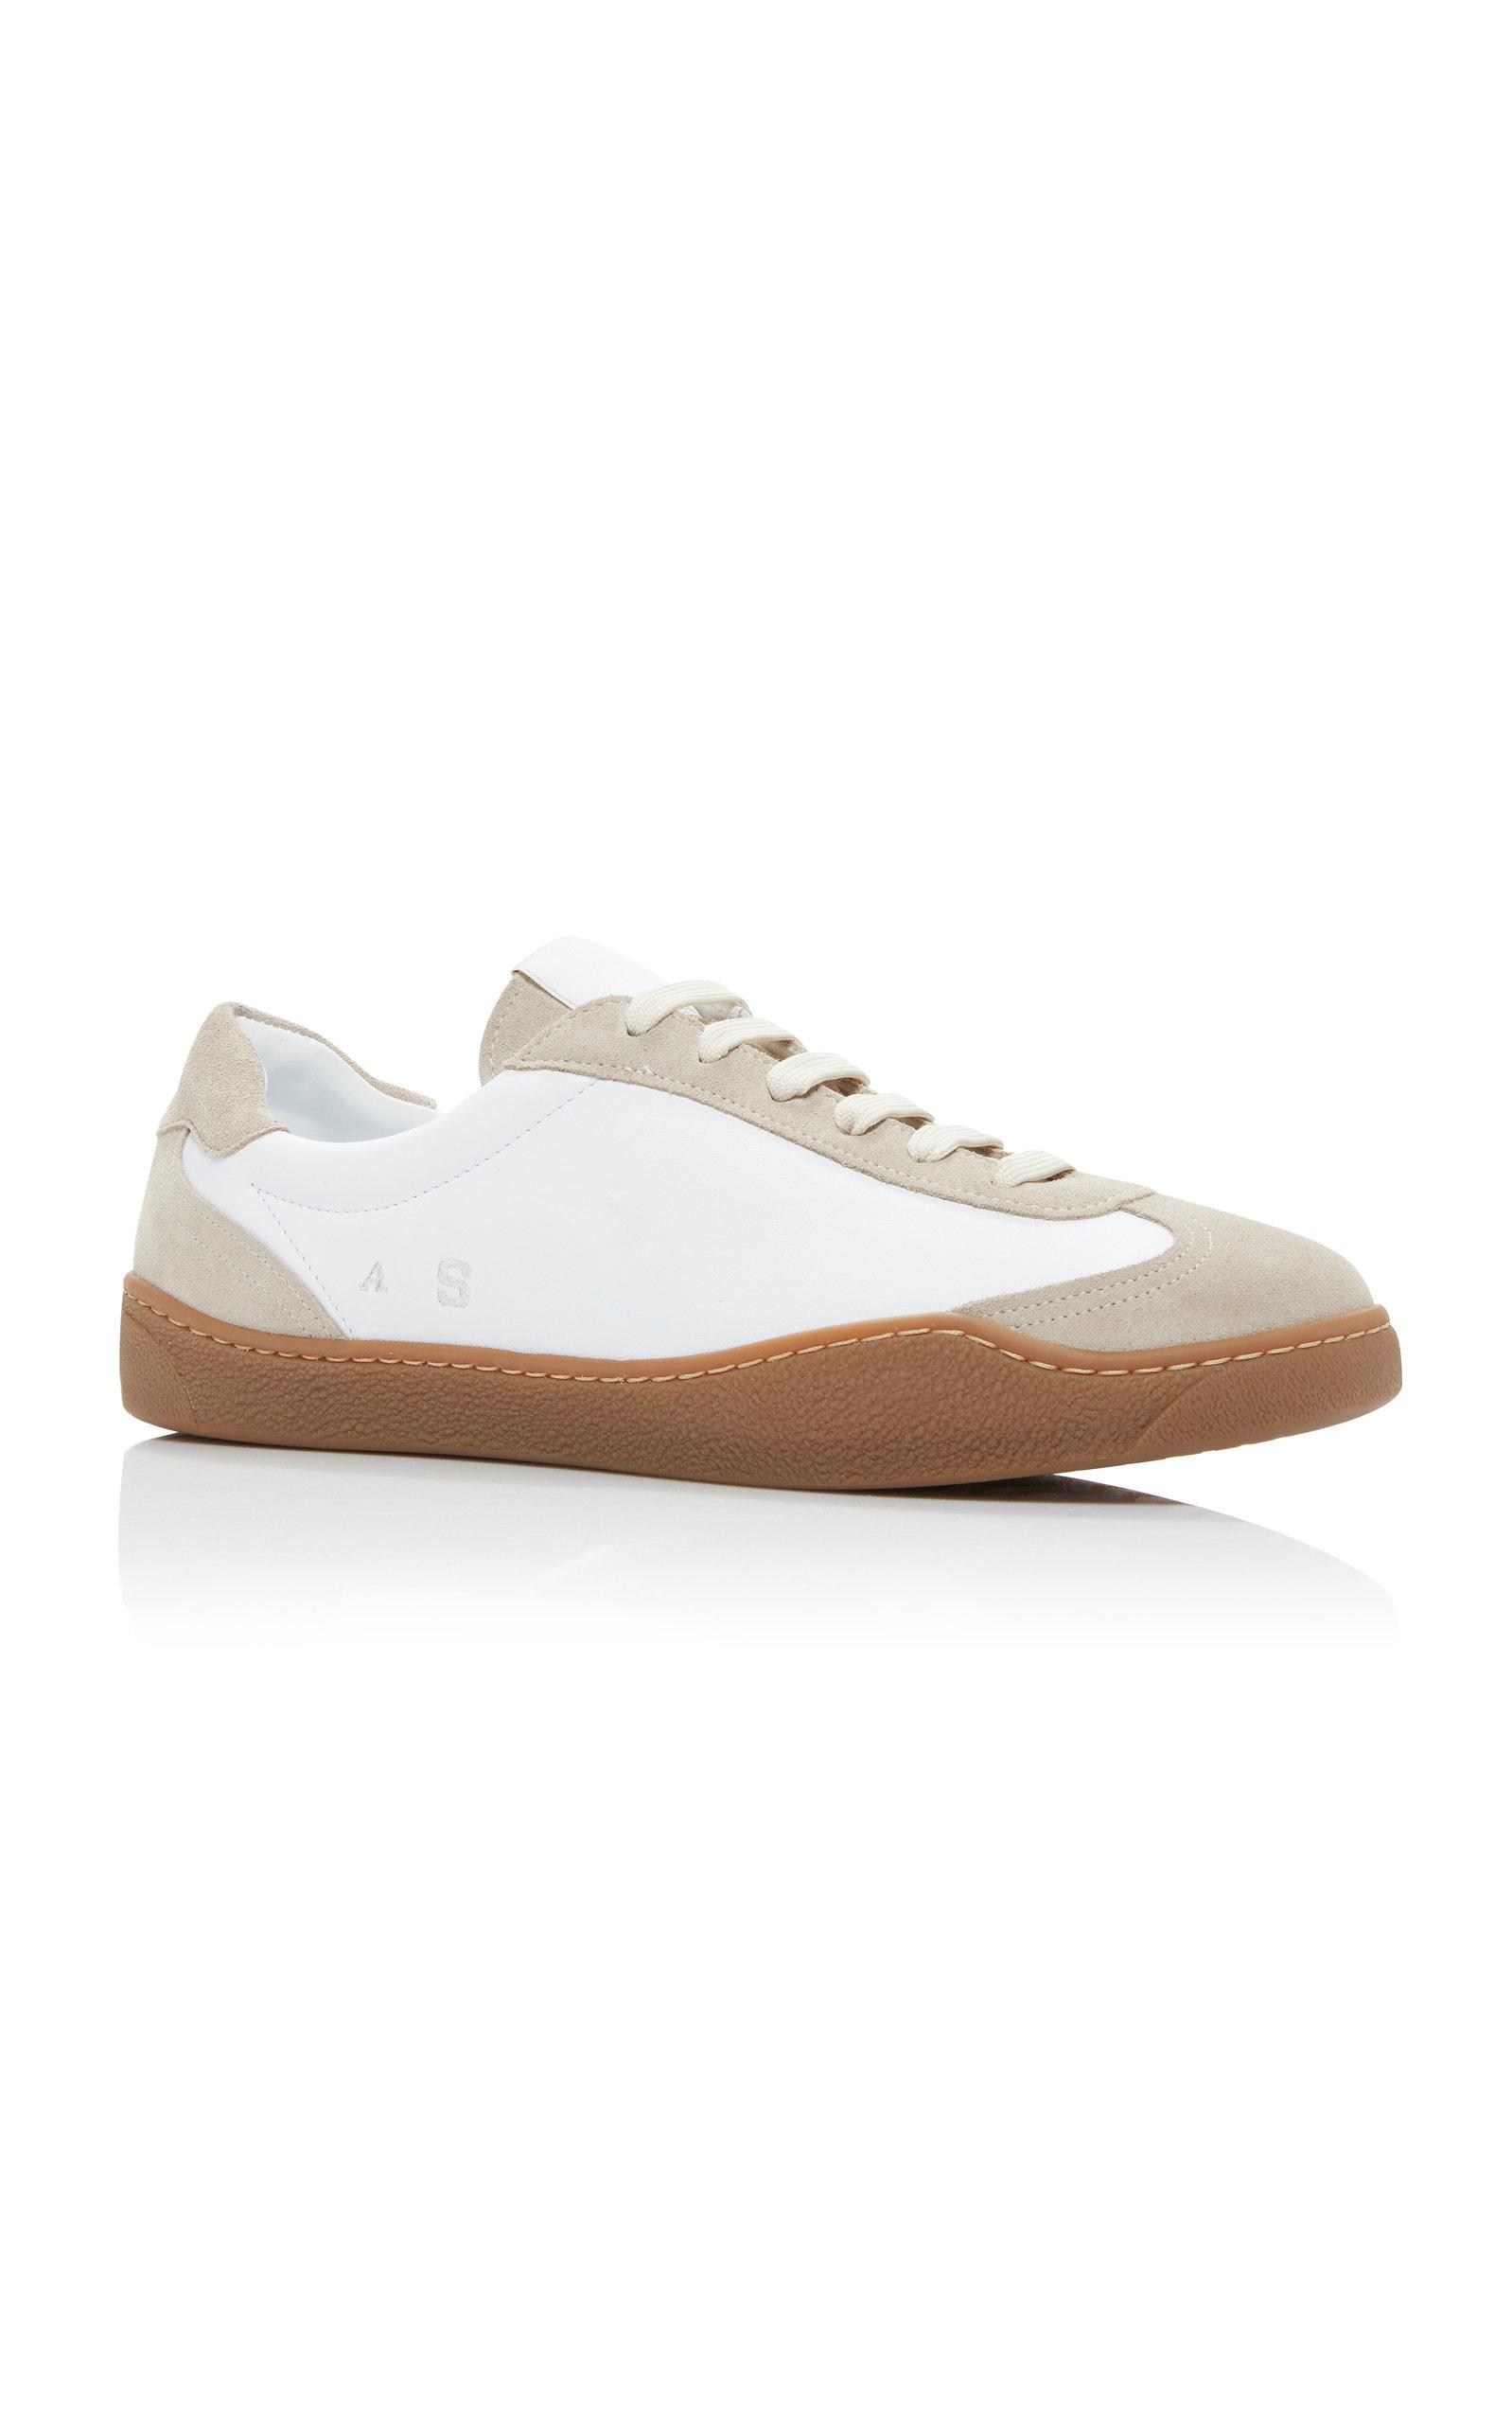 promo code 097e3 a9ec7 large acne-studios-neutral-lars-leather-sneakers.jpg